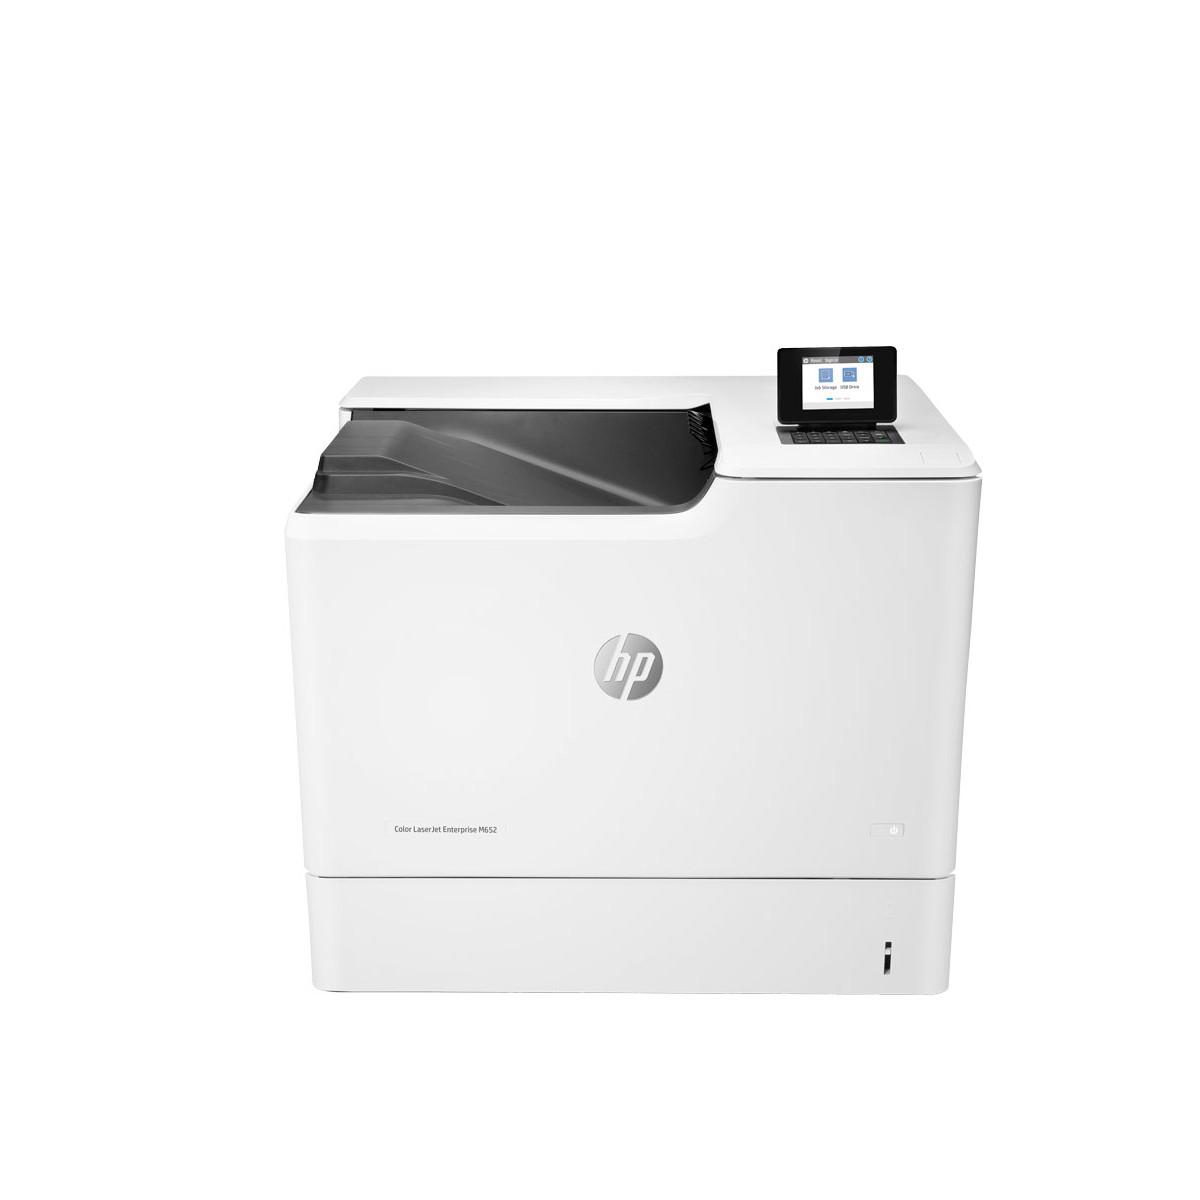 Принтер HP Color LaserJet Enterprise M553n (А4, Лазерный, Цветной, USB, Ethernet) B5L24A